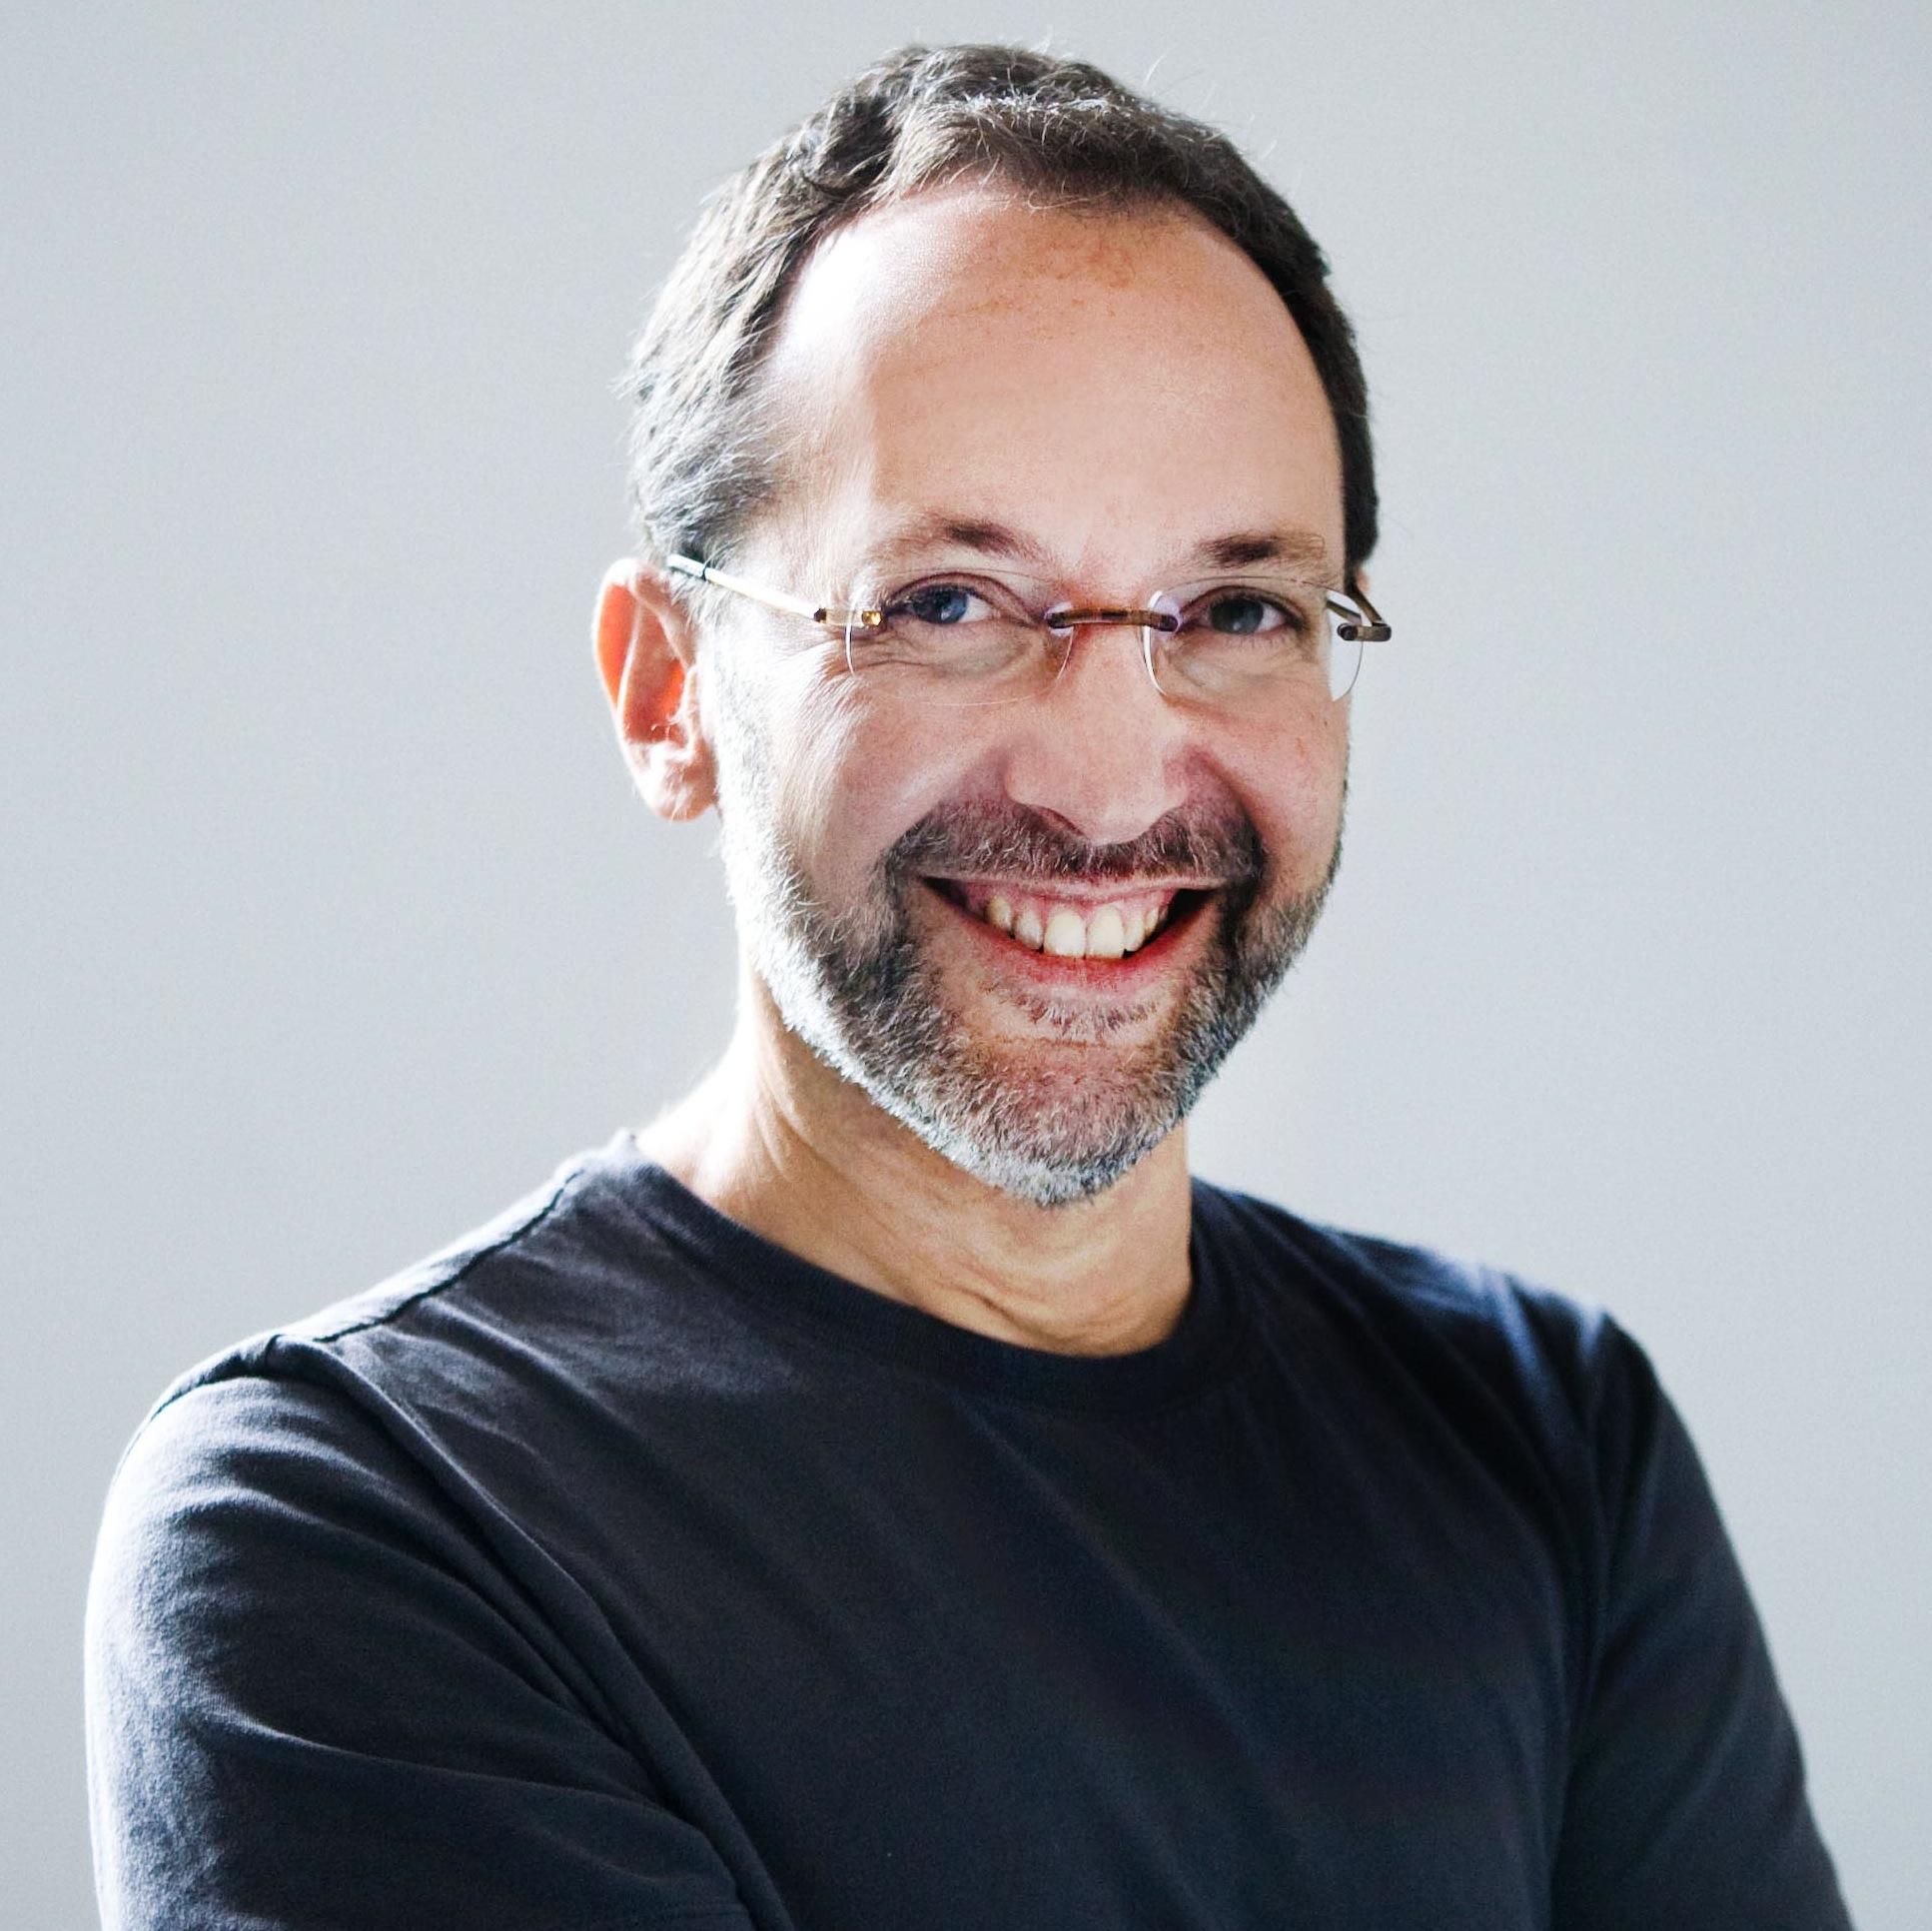 Photo of Jonathan Weiner by Piotr Redlinski